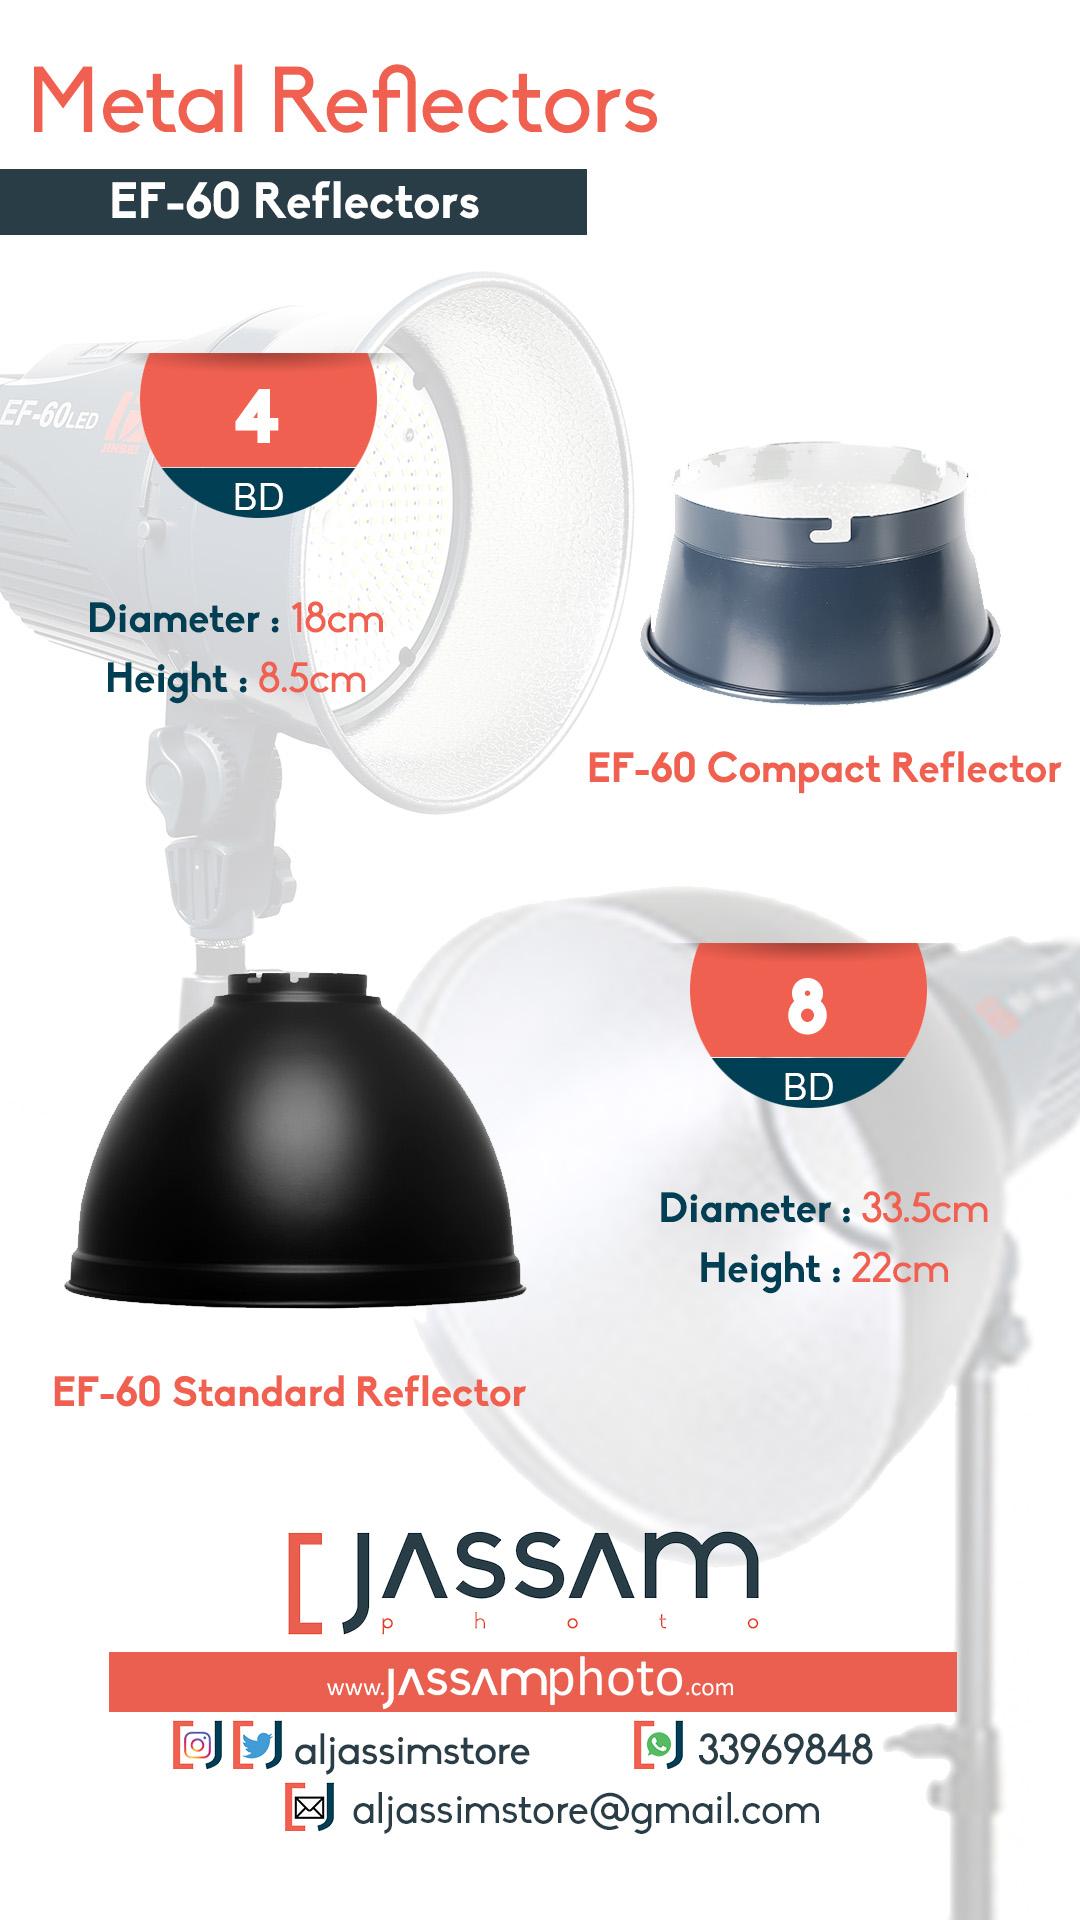 EF-60 Reflector